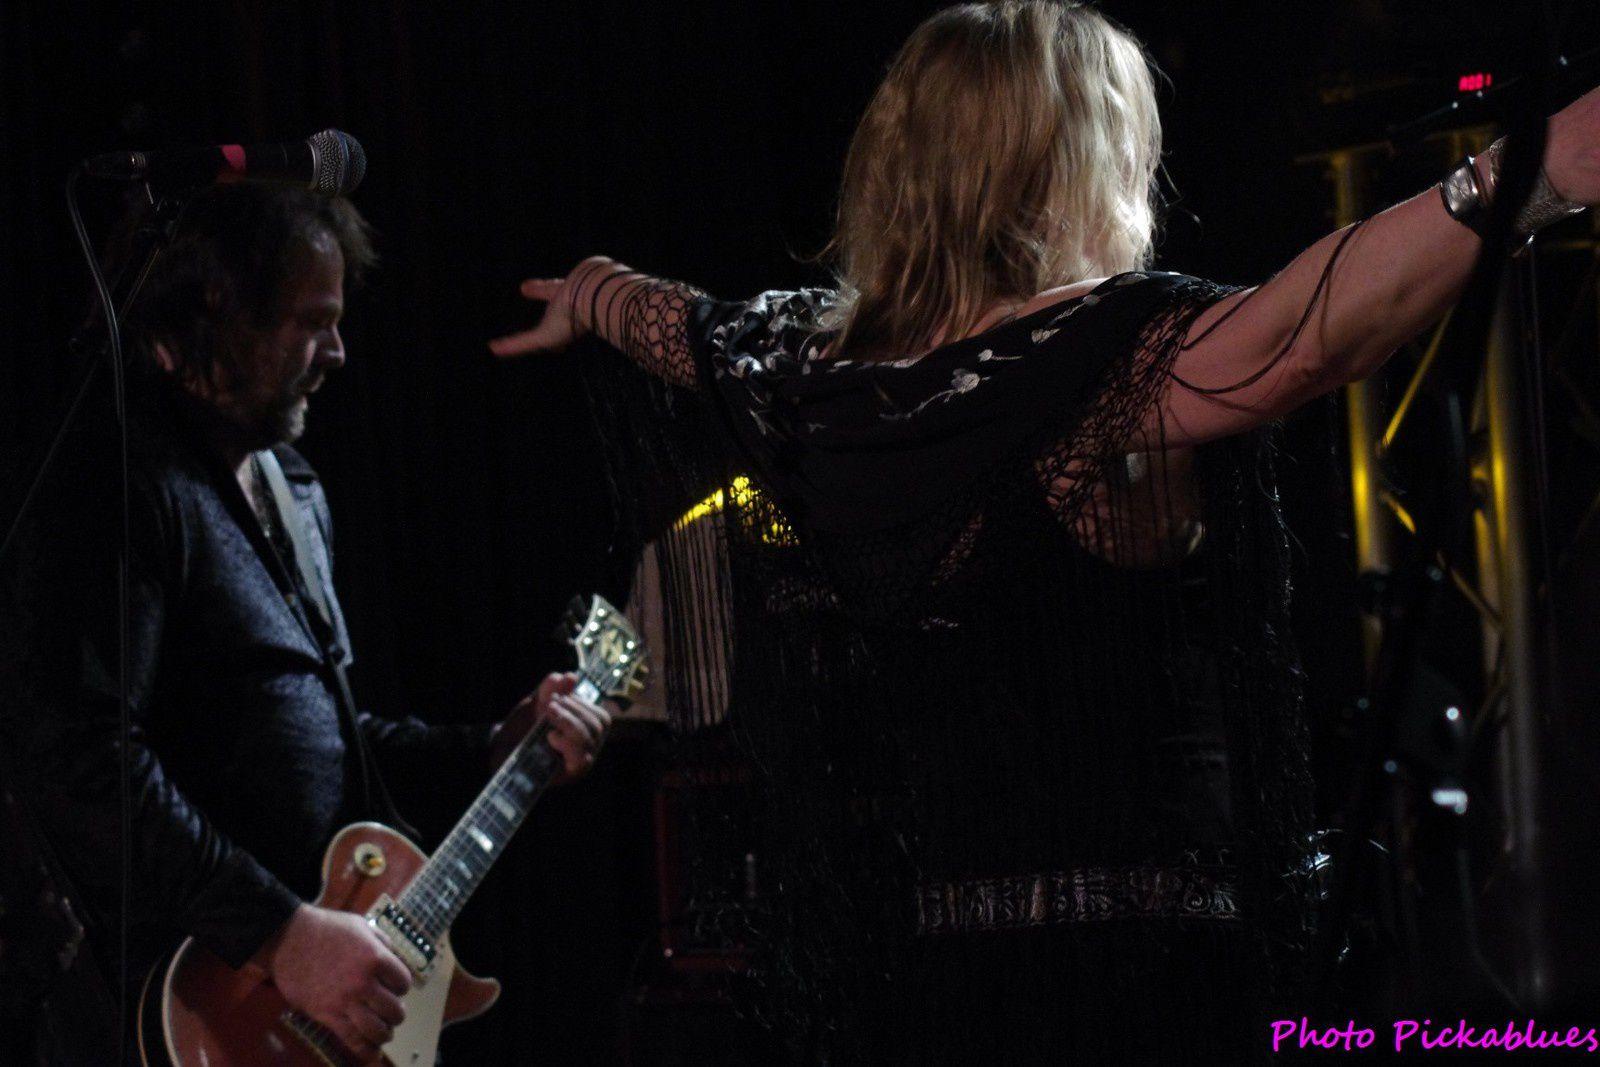 Deborah Bonham - 10 mars 2016 - La Boite à Musique, Wattrelos (59)